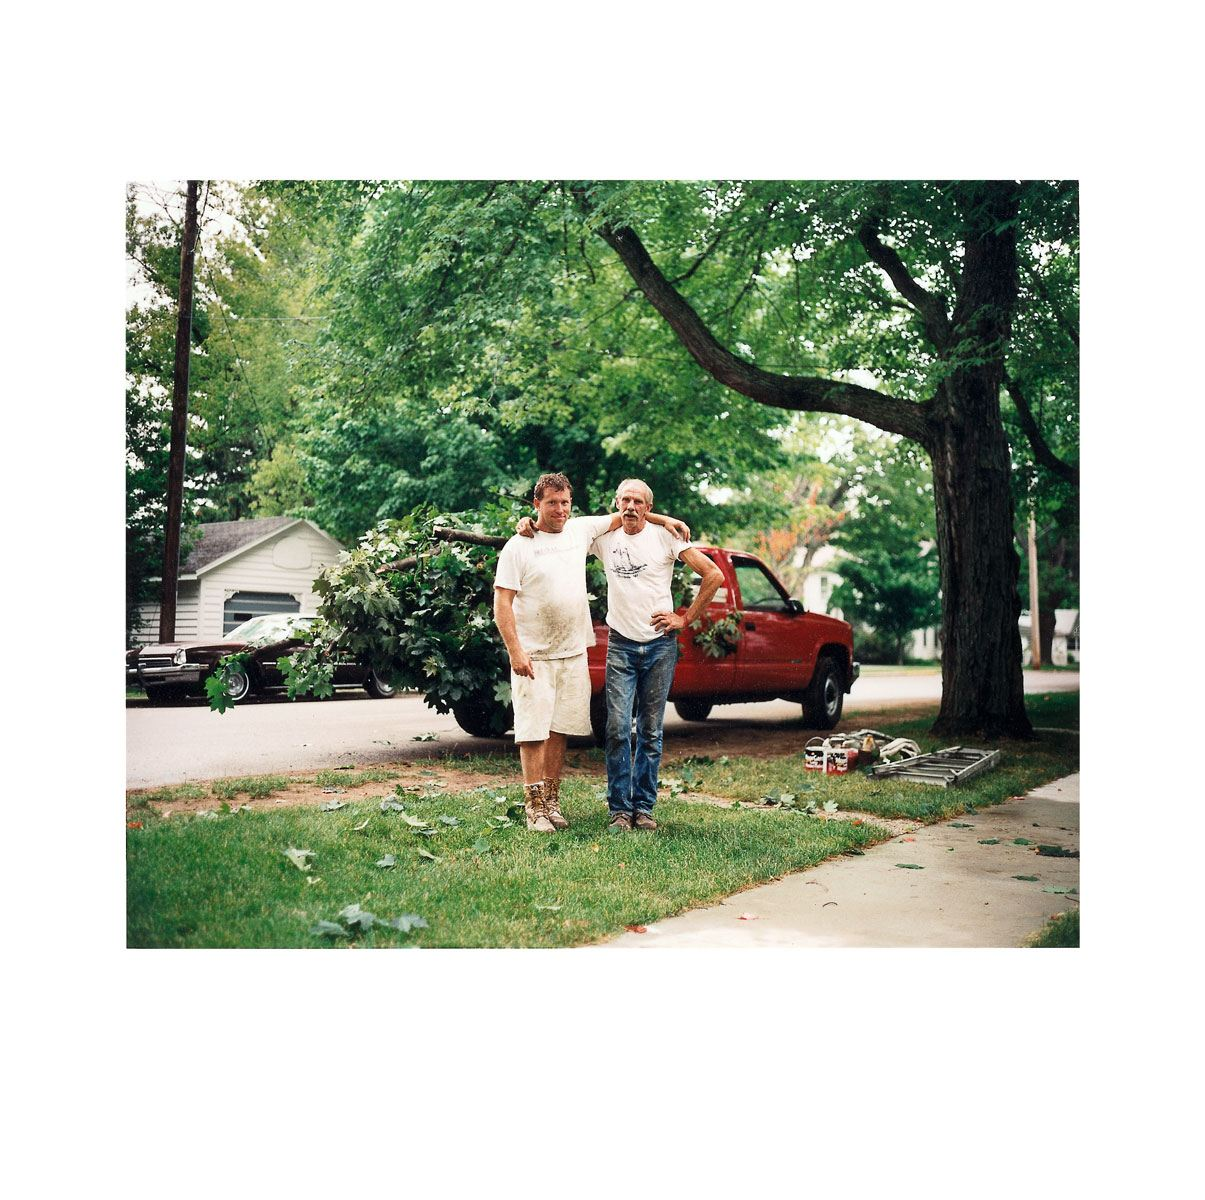 """Jim and Tom"" | Village Portrait | Pentwater, Michigan, USA | 1996"